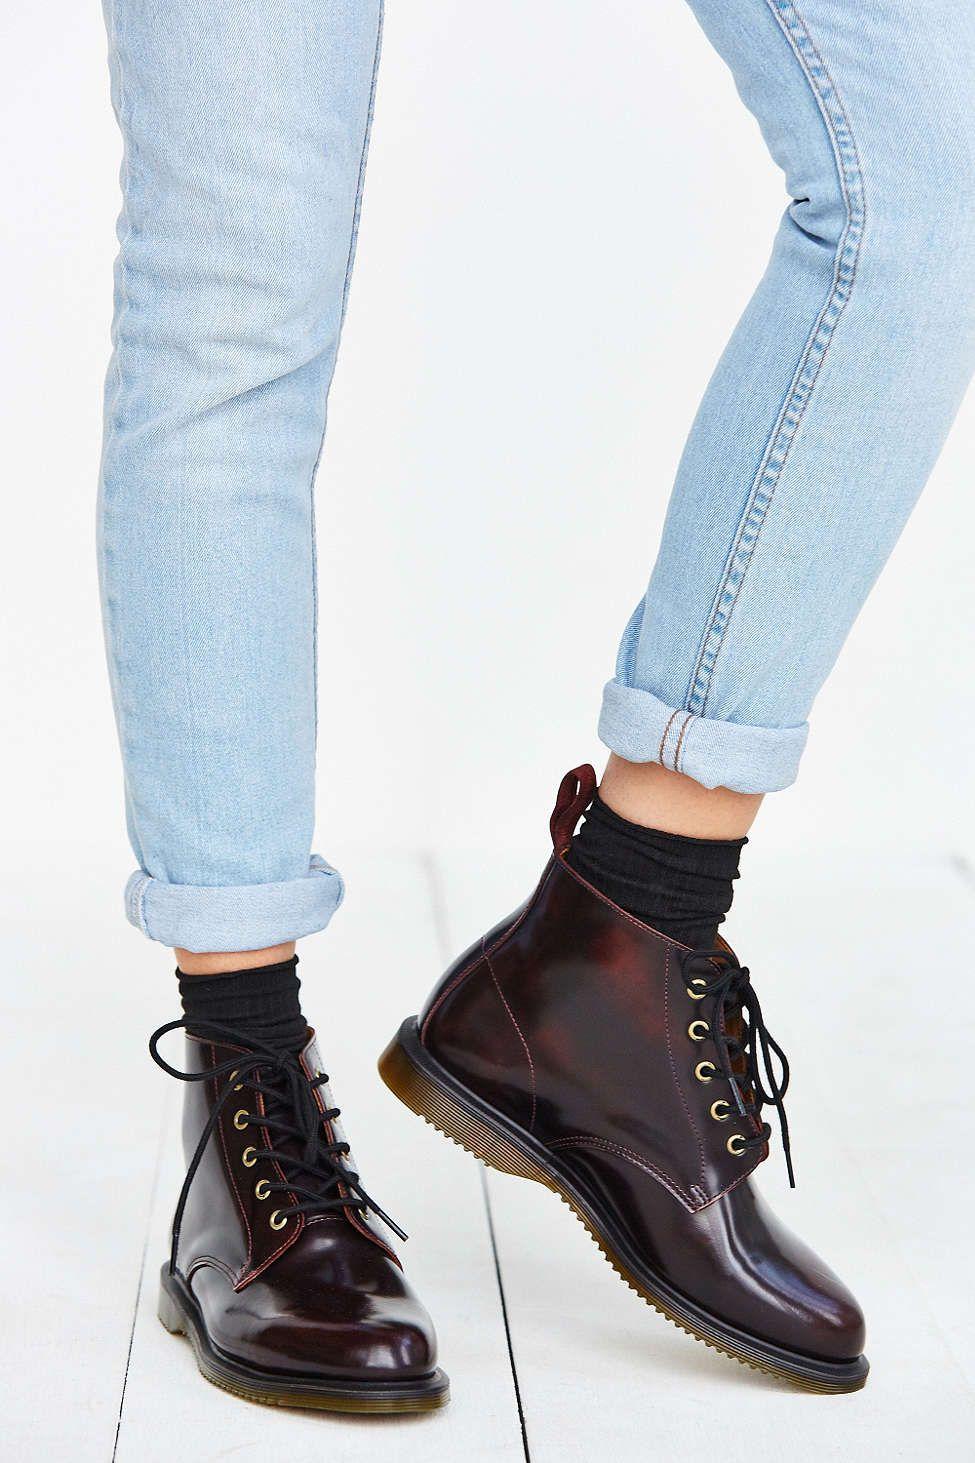 Populaire Dr. Martens Emmeline 5-Eye Boot … | Pinteres… CI15